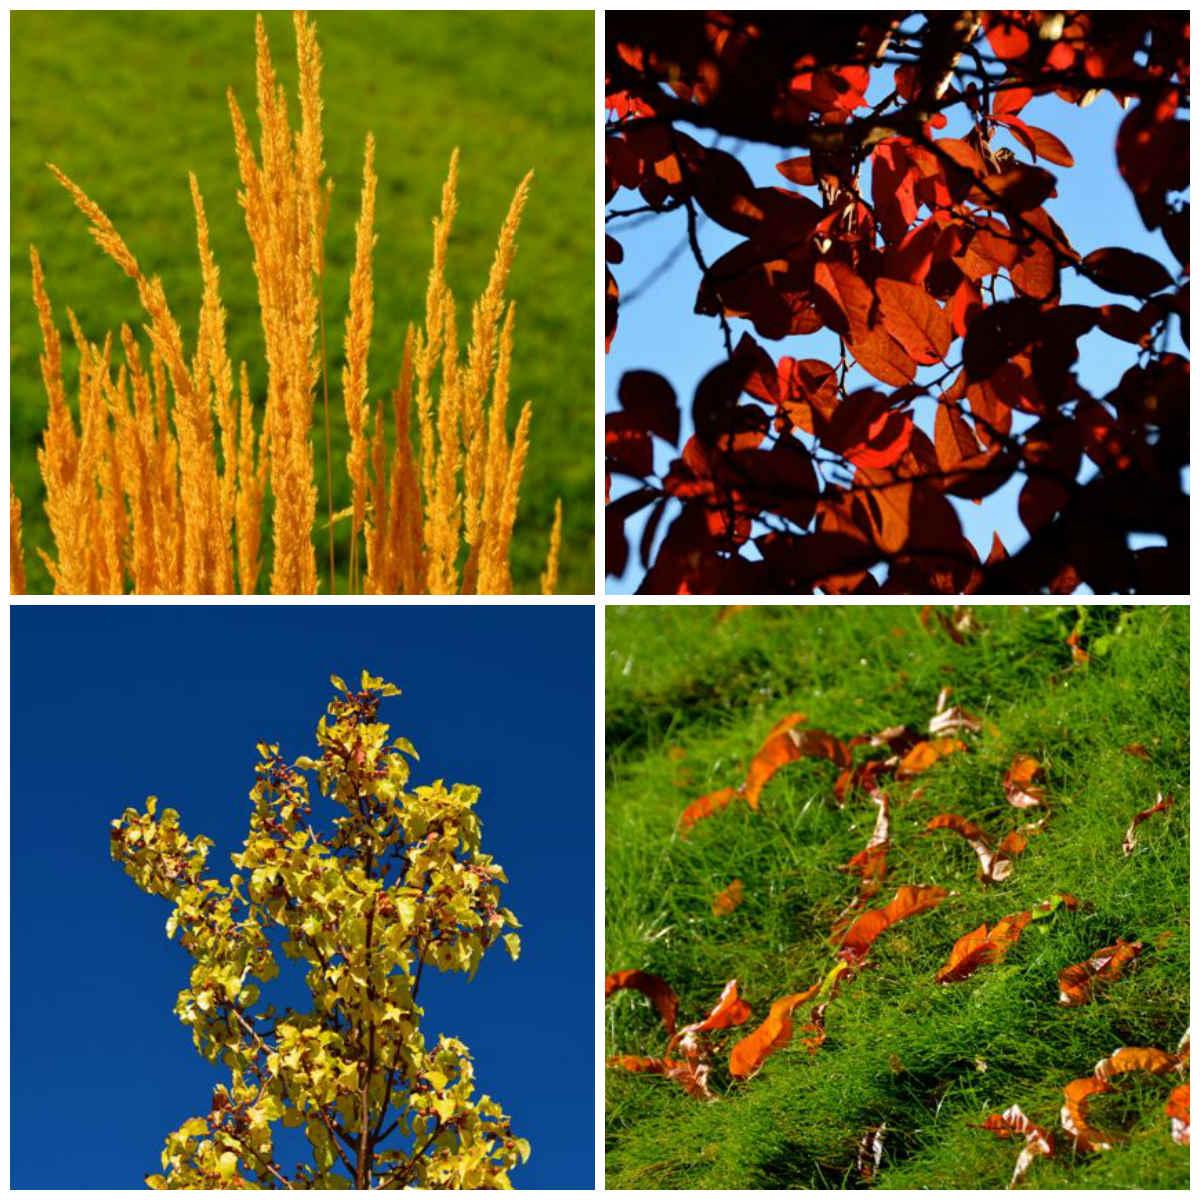 autumn leaves collage reno nevada